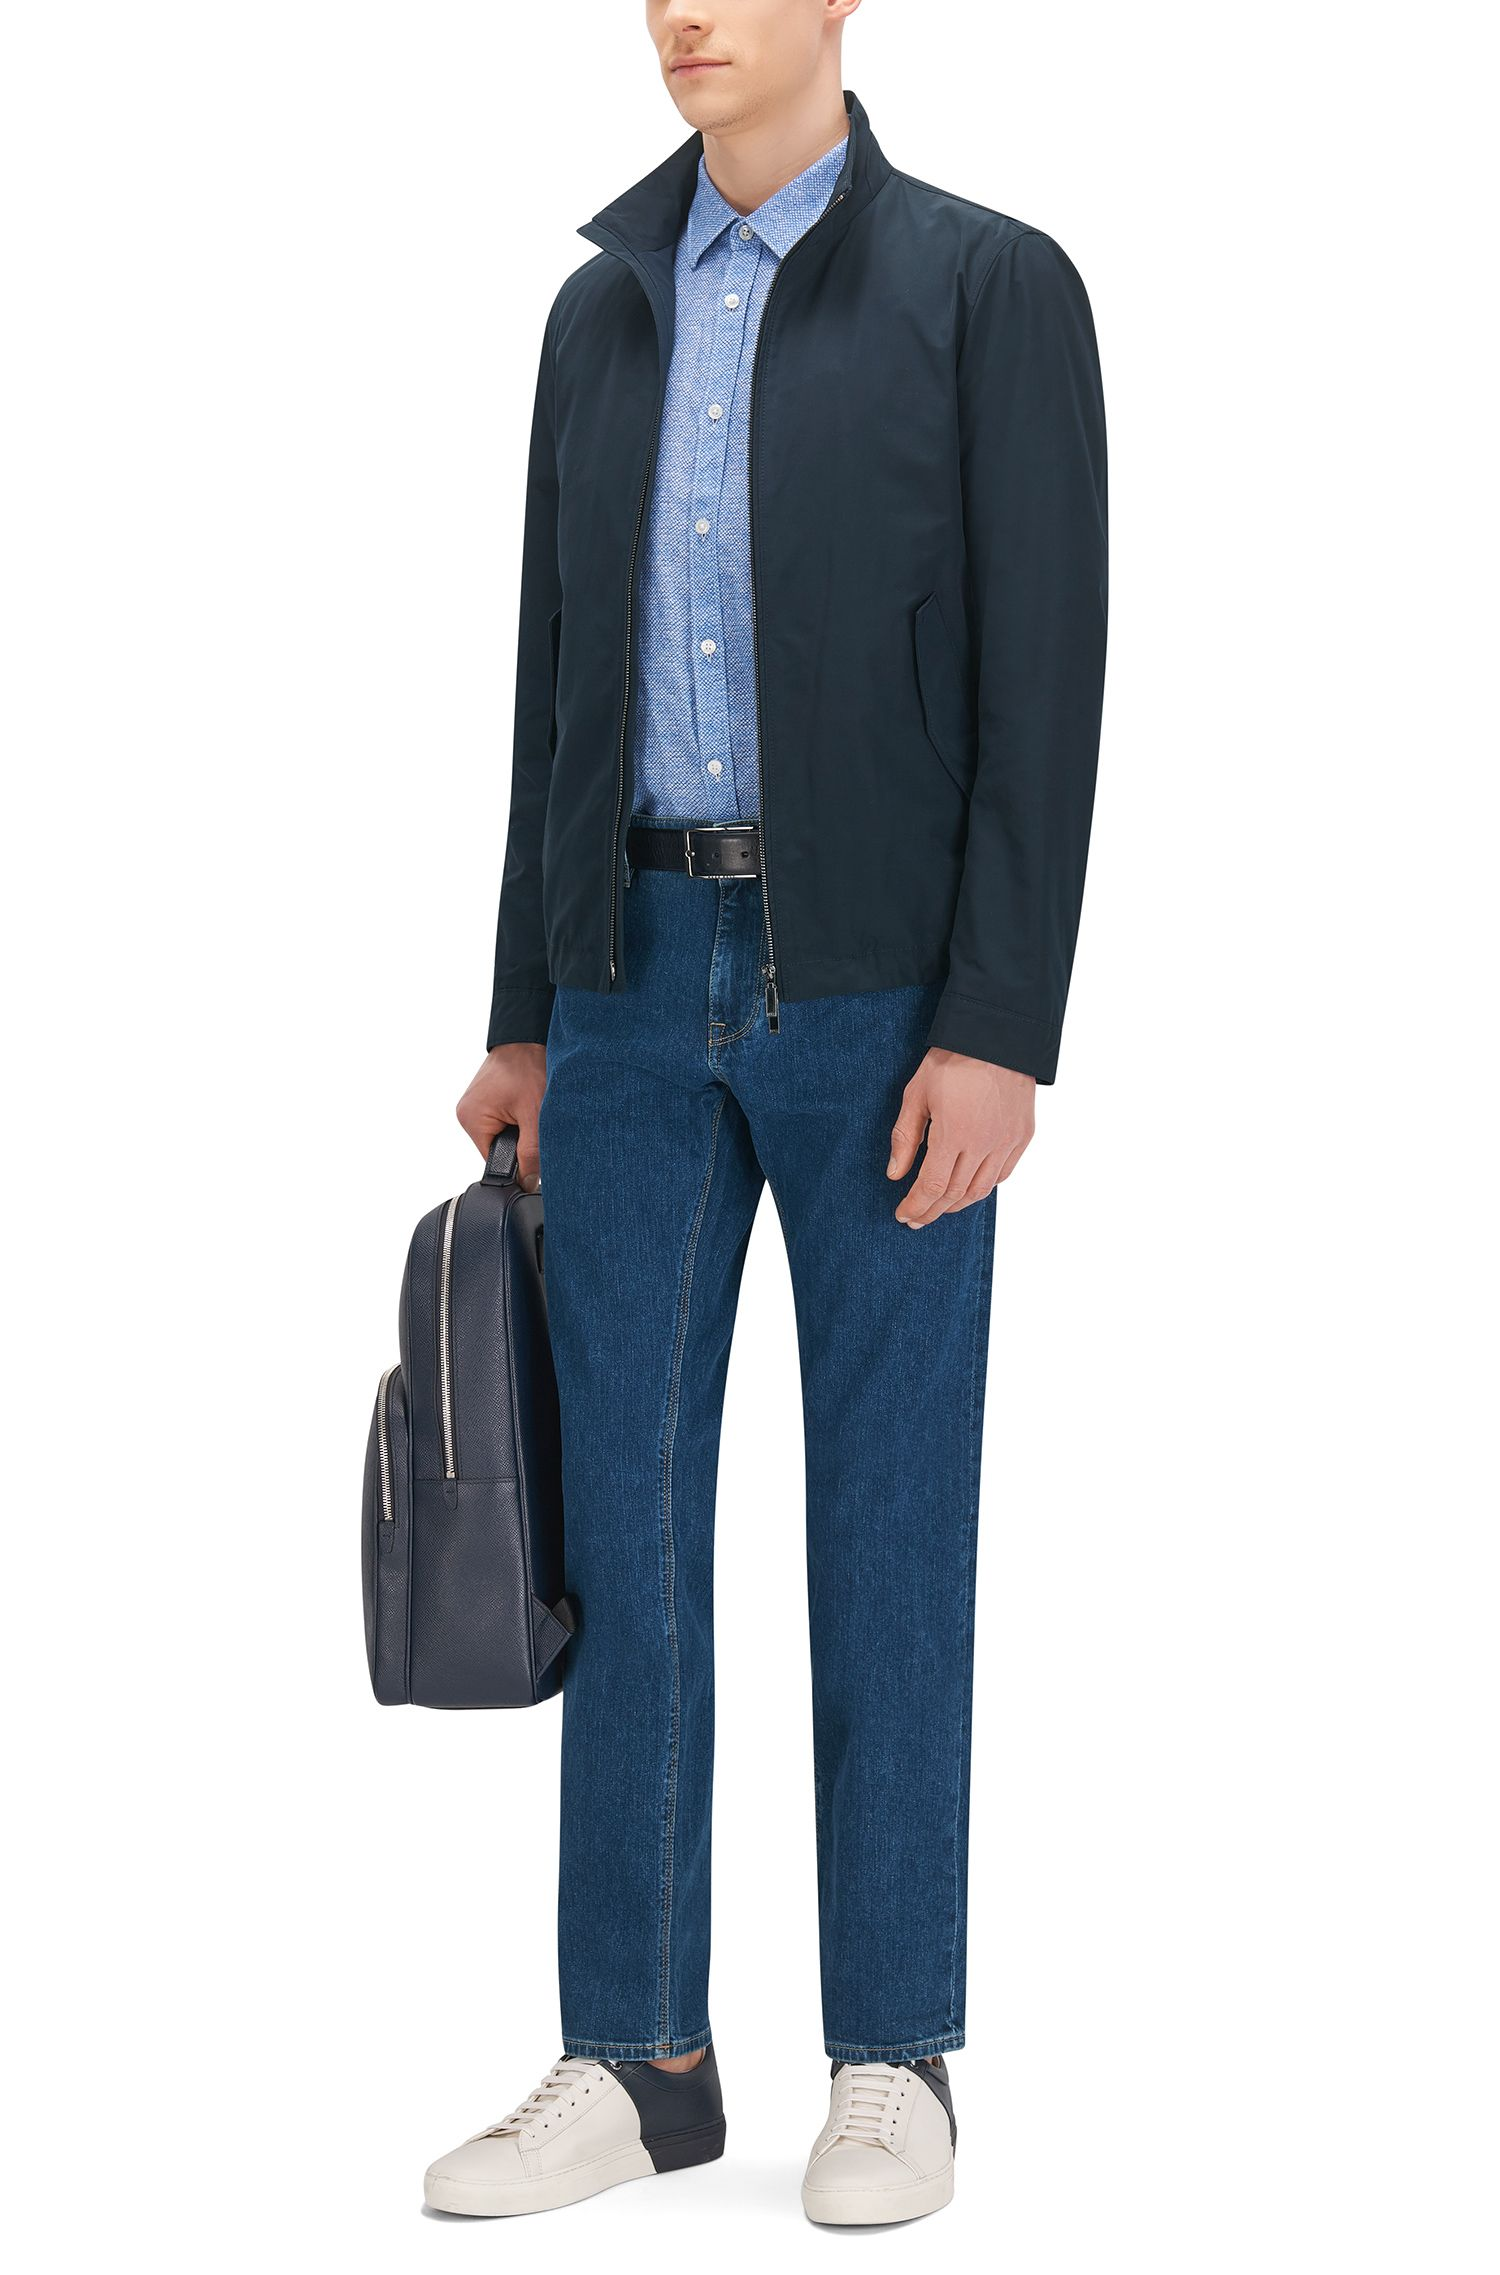 Linen Garment-Washed Button Down Shirt, Slim Fit | Ronn, Blue